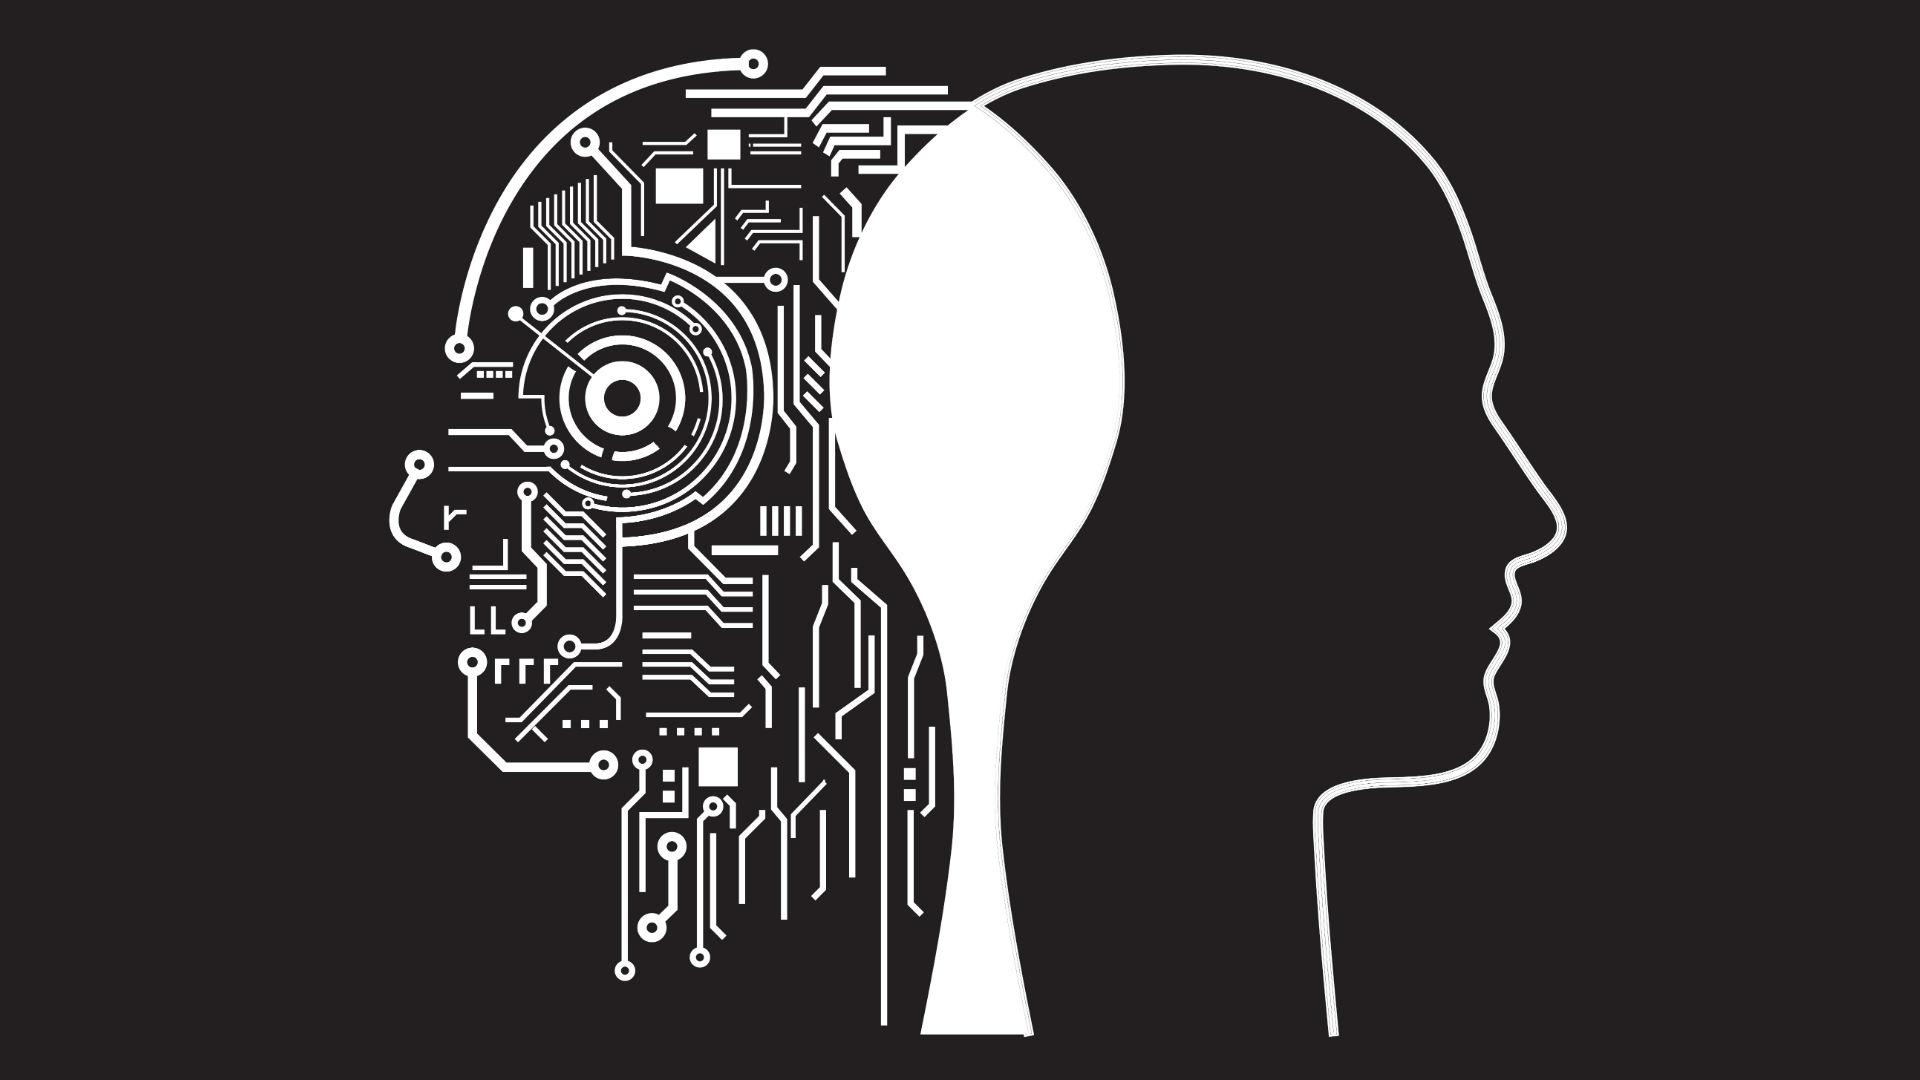 Ukrainians have created an artificial intelligence program